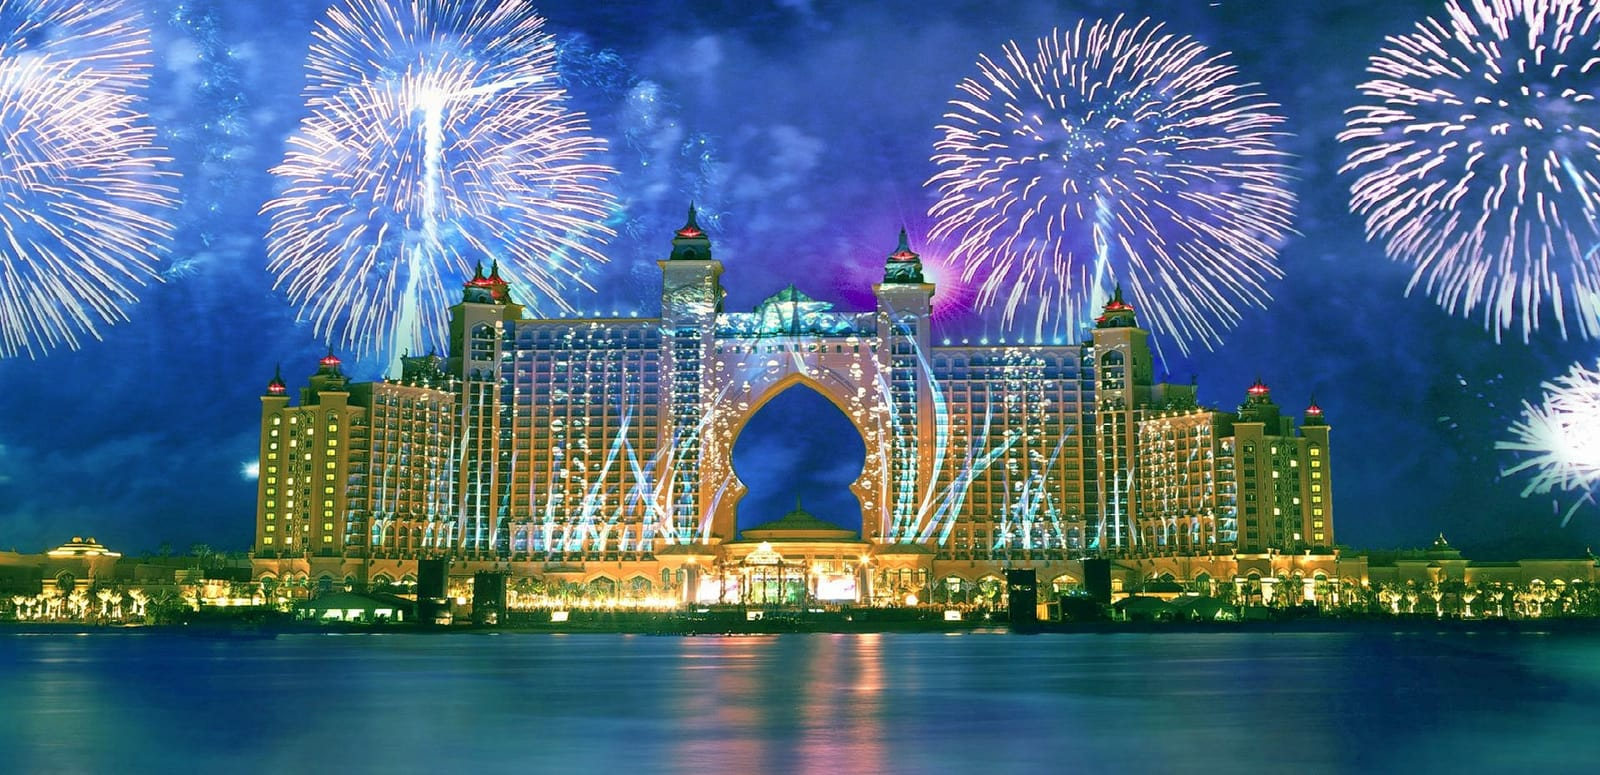 1464185944_6924794-atlantis-dubai-fireworks.jpg